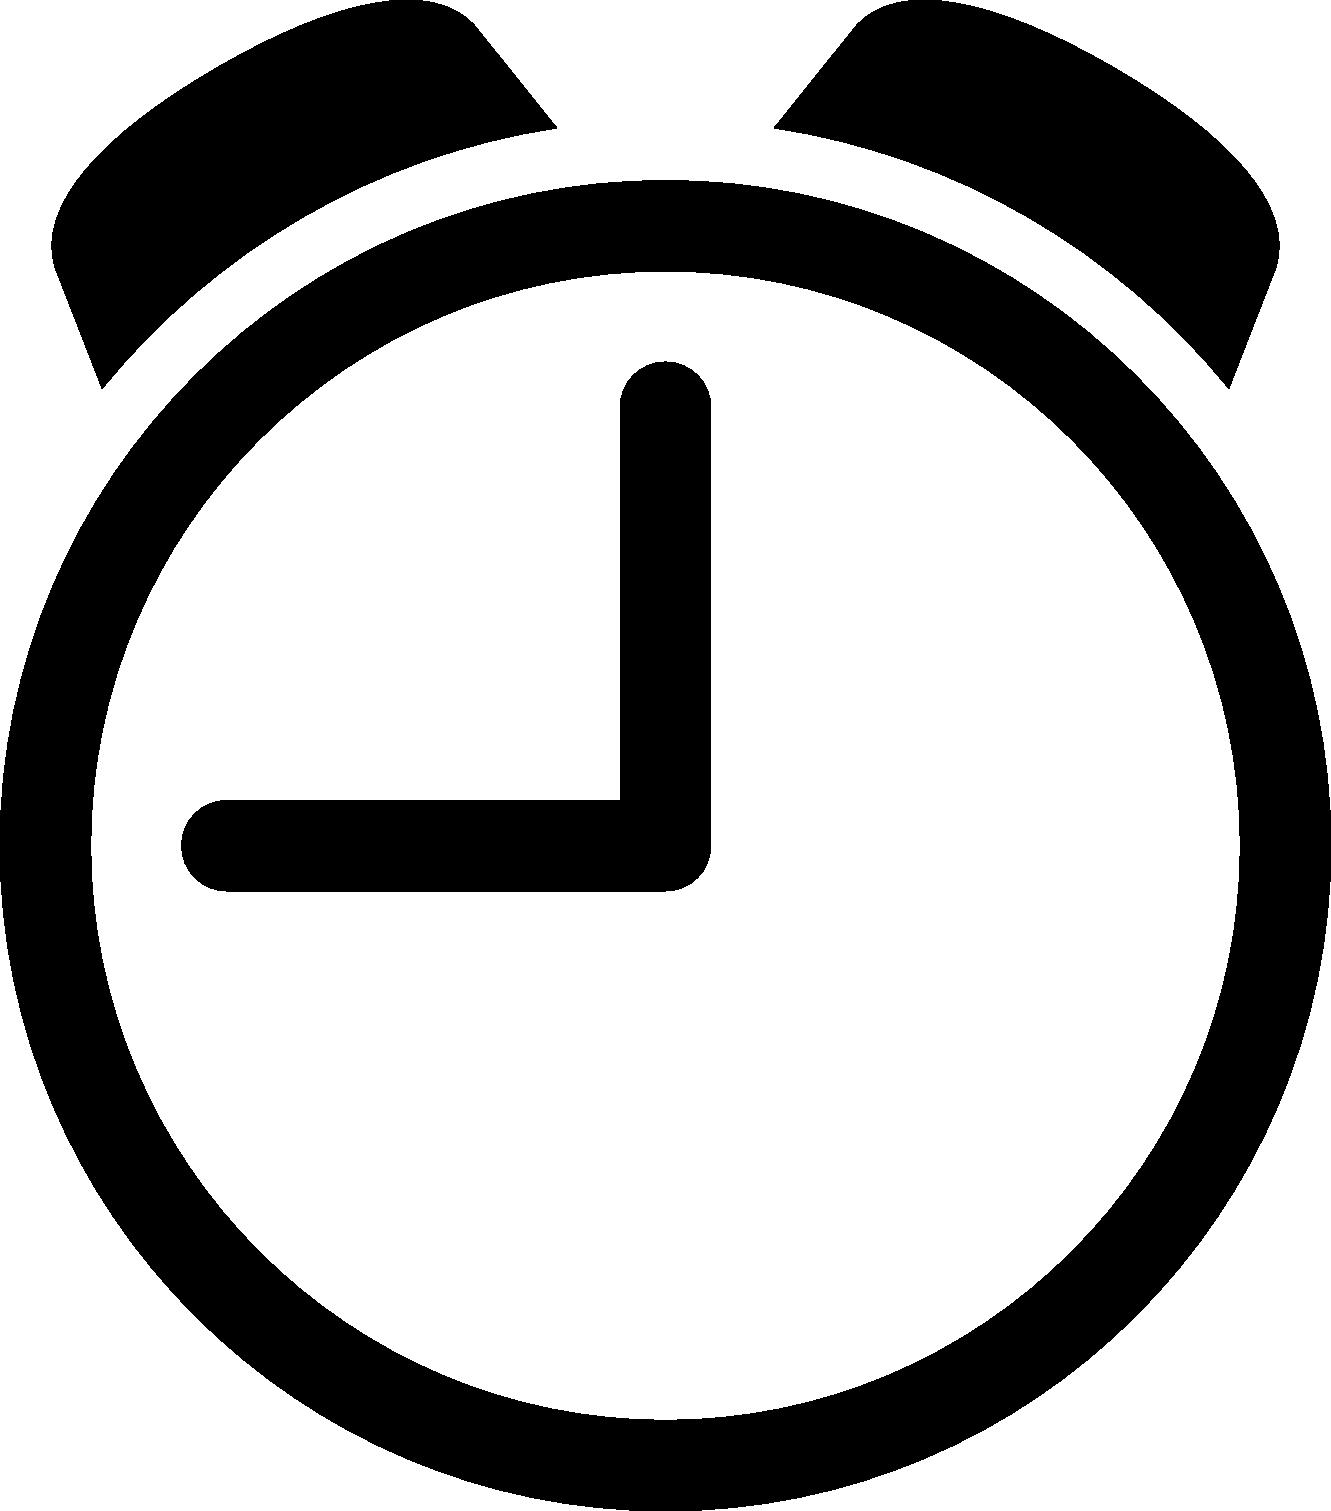 Clock PNG Image